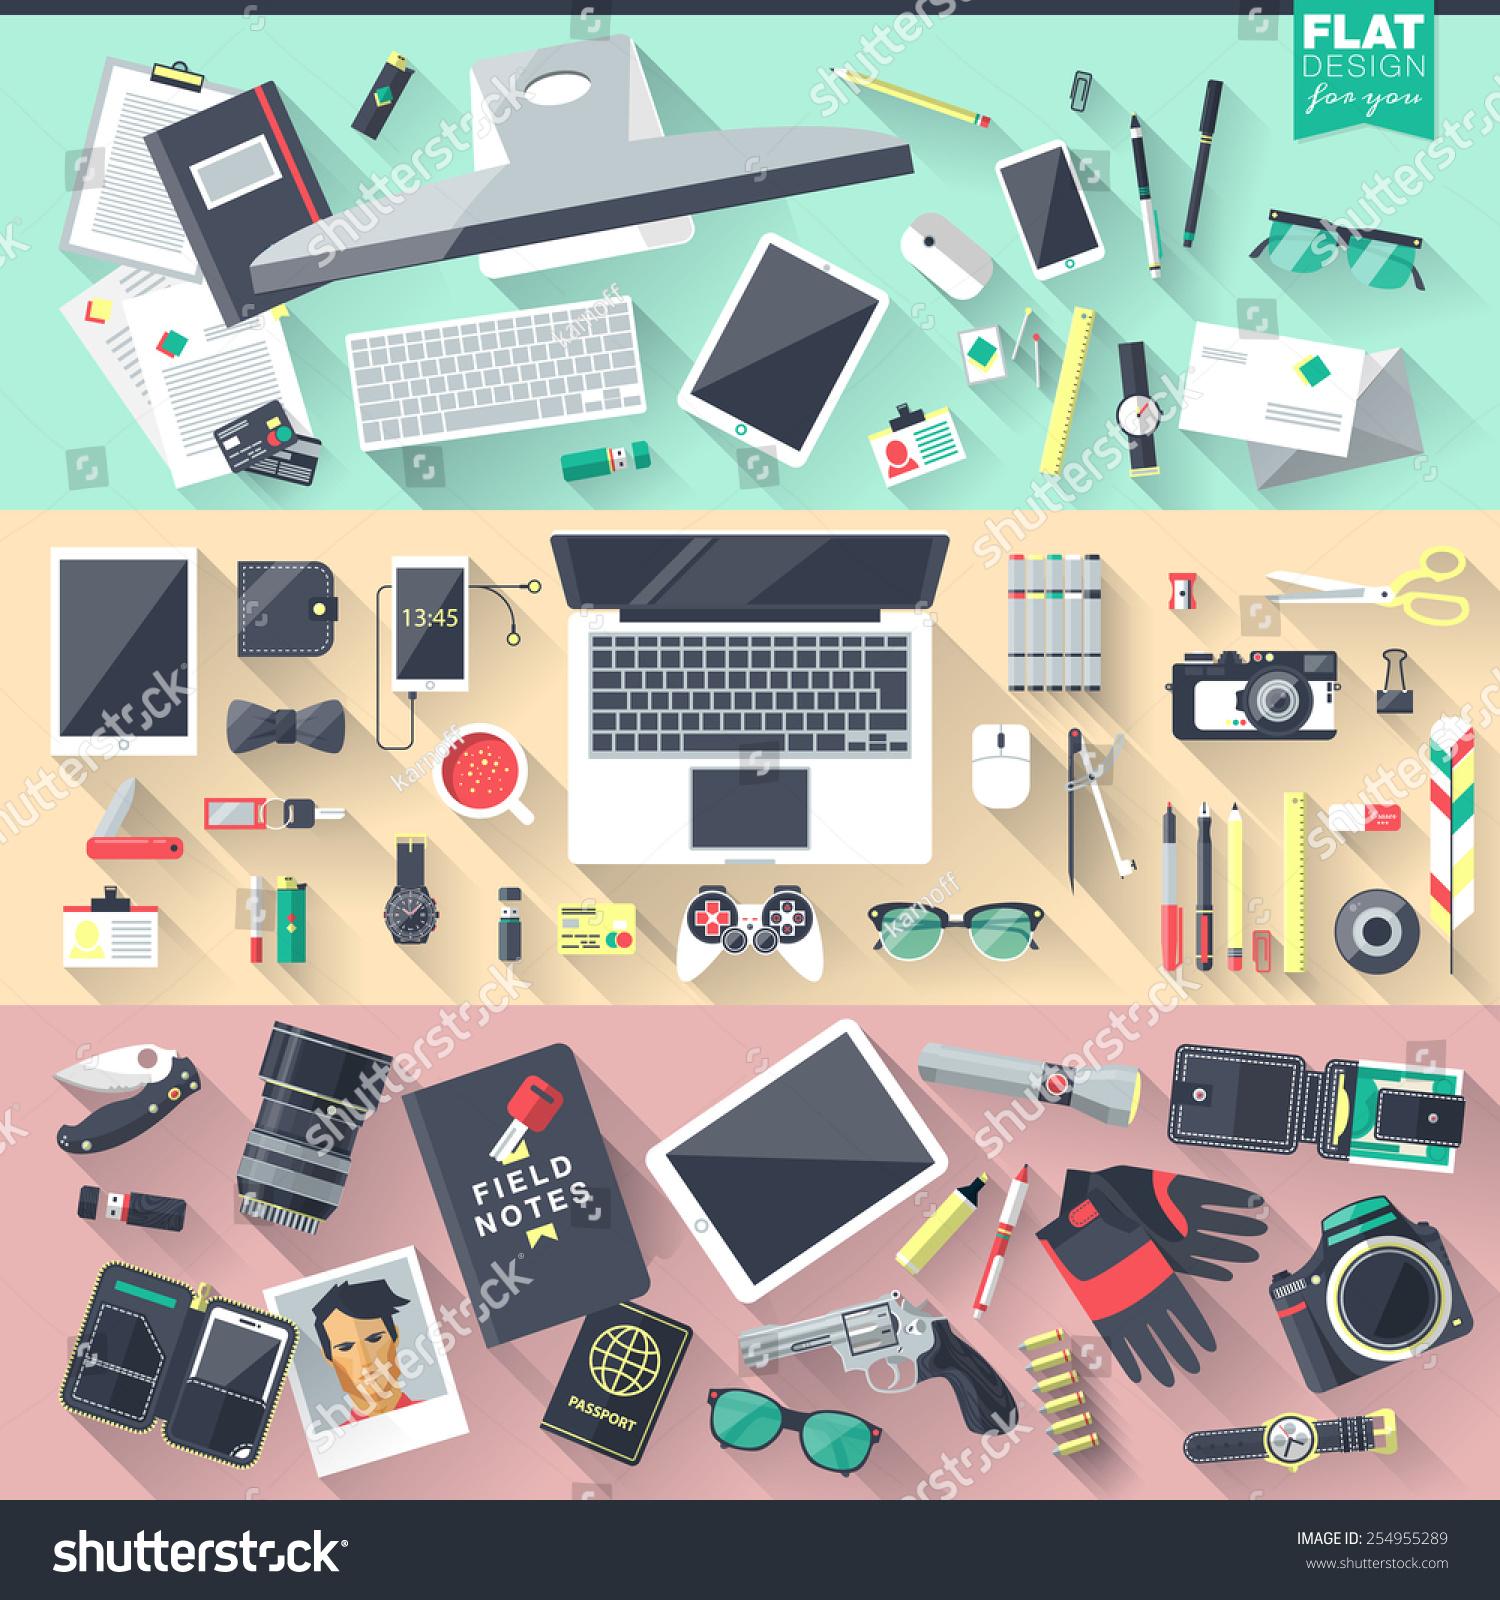 Flat design illustration workspace workplace concepts for Digital marketing materials